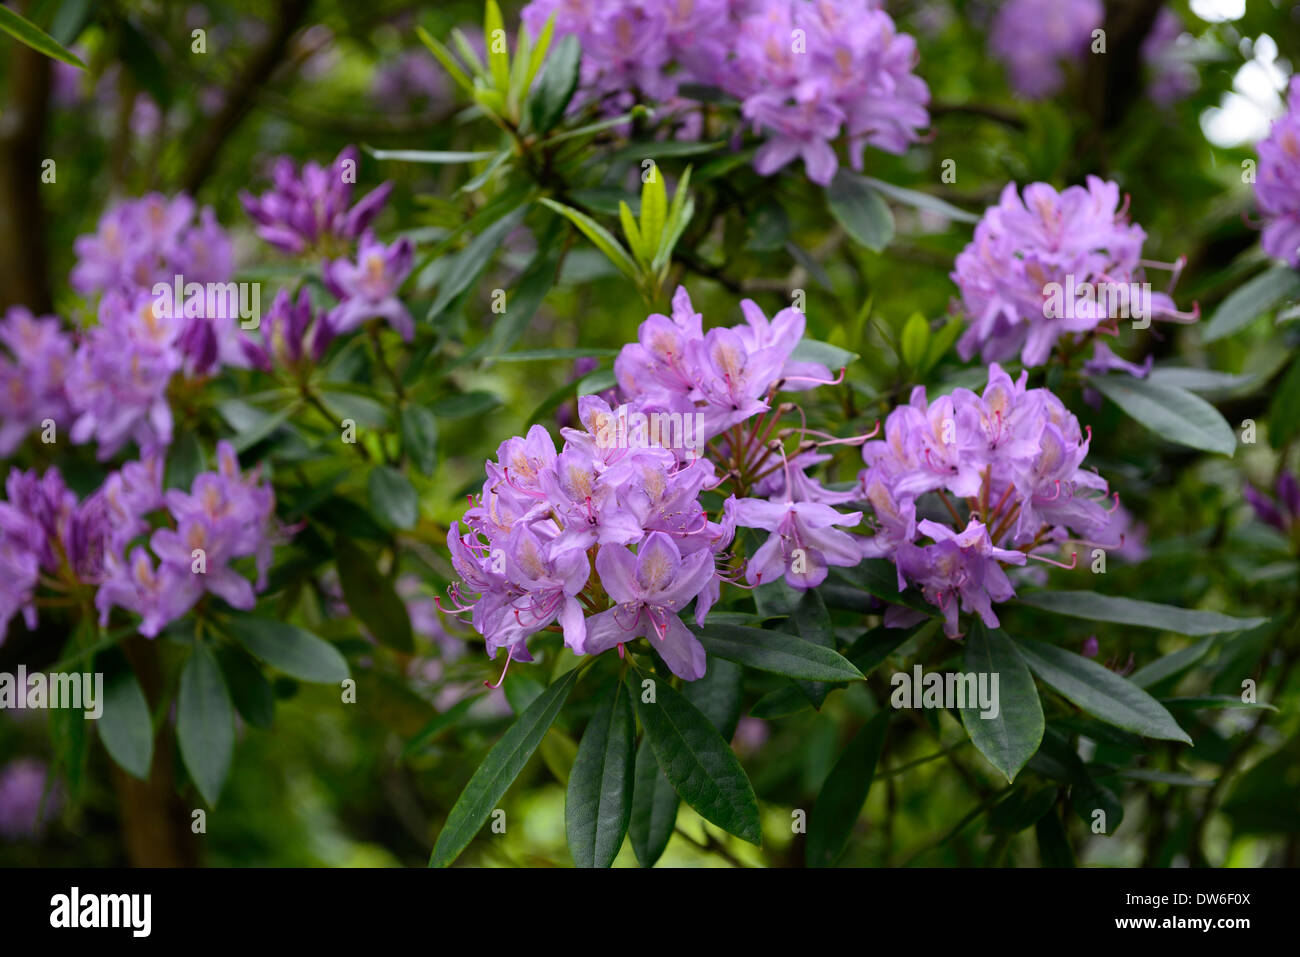 Rhododendron ponticum purple flowers flower flowering evergreen rhododendron ponticum purple flowers flower flowering evergreen green leaves foliage tree trees mightylinksfo